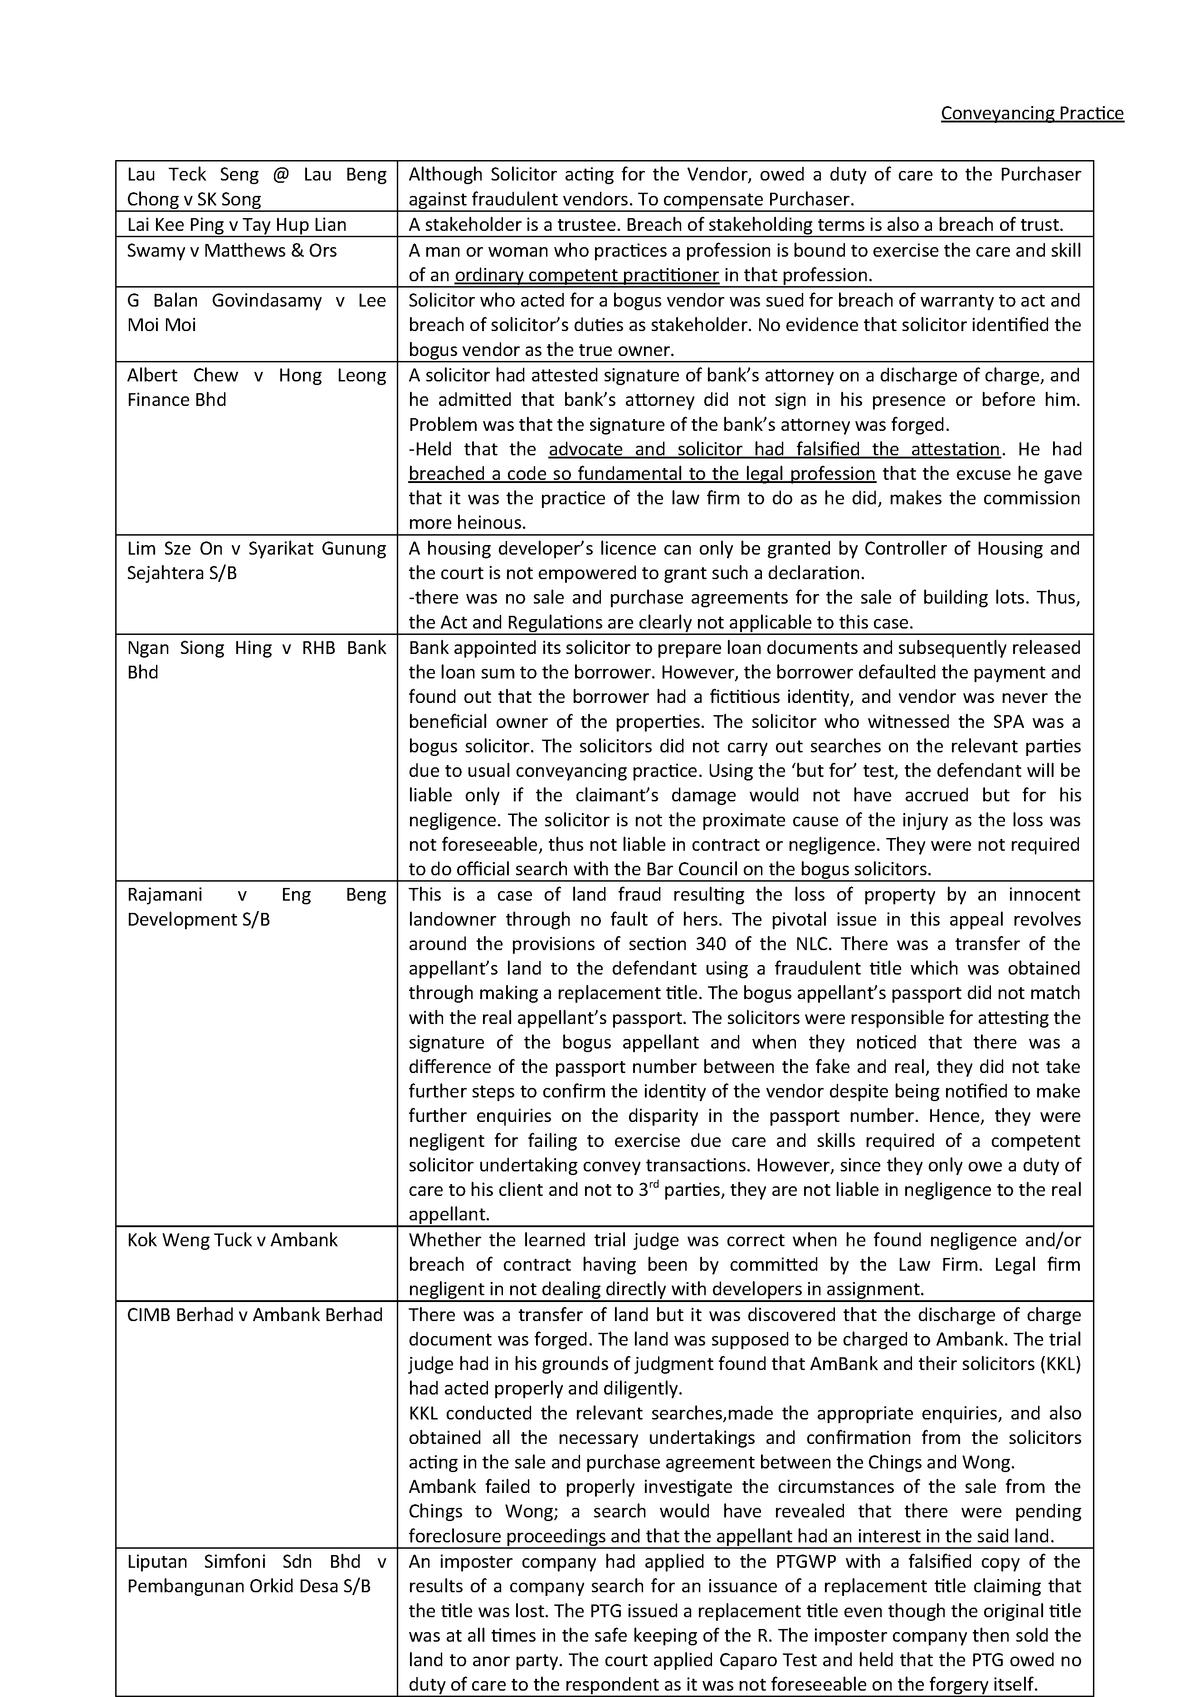 Conveyancing notes- cases - Criminal Procedure UCP4162 - StuDocu